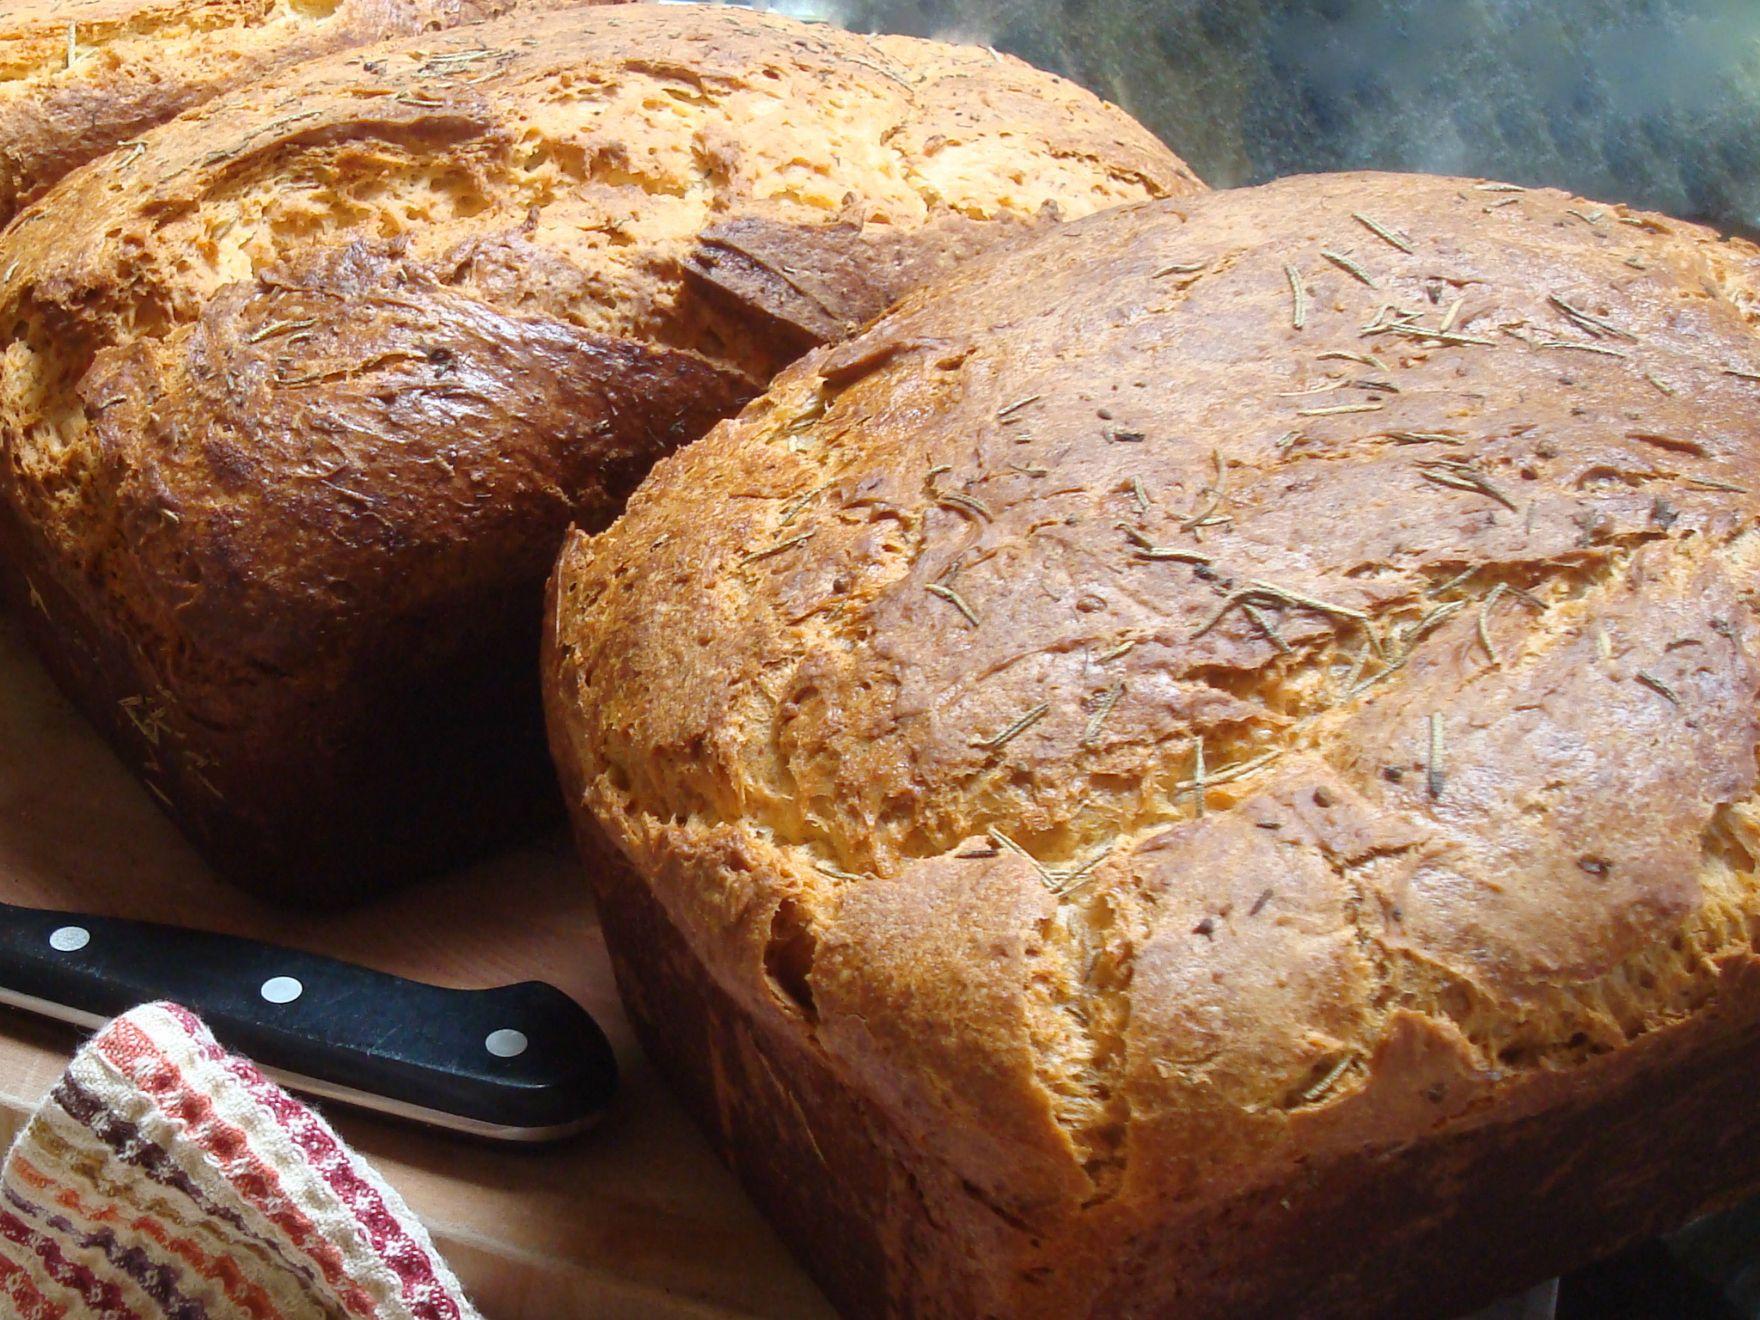 Gluten free 2good2b bread bakery cafe artisan bread